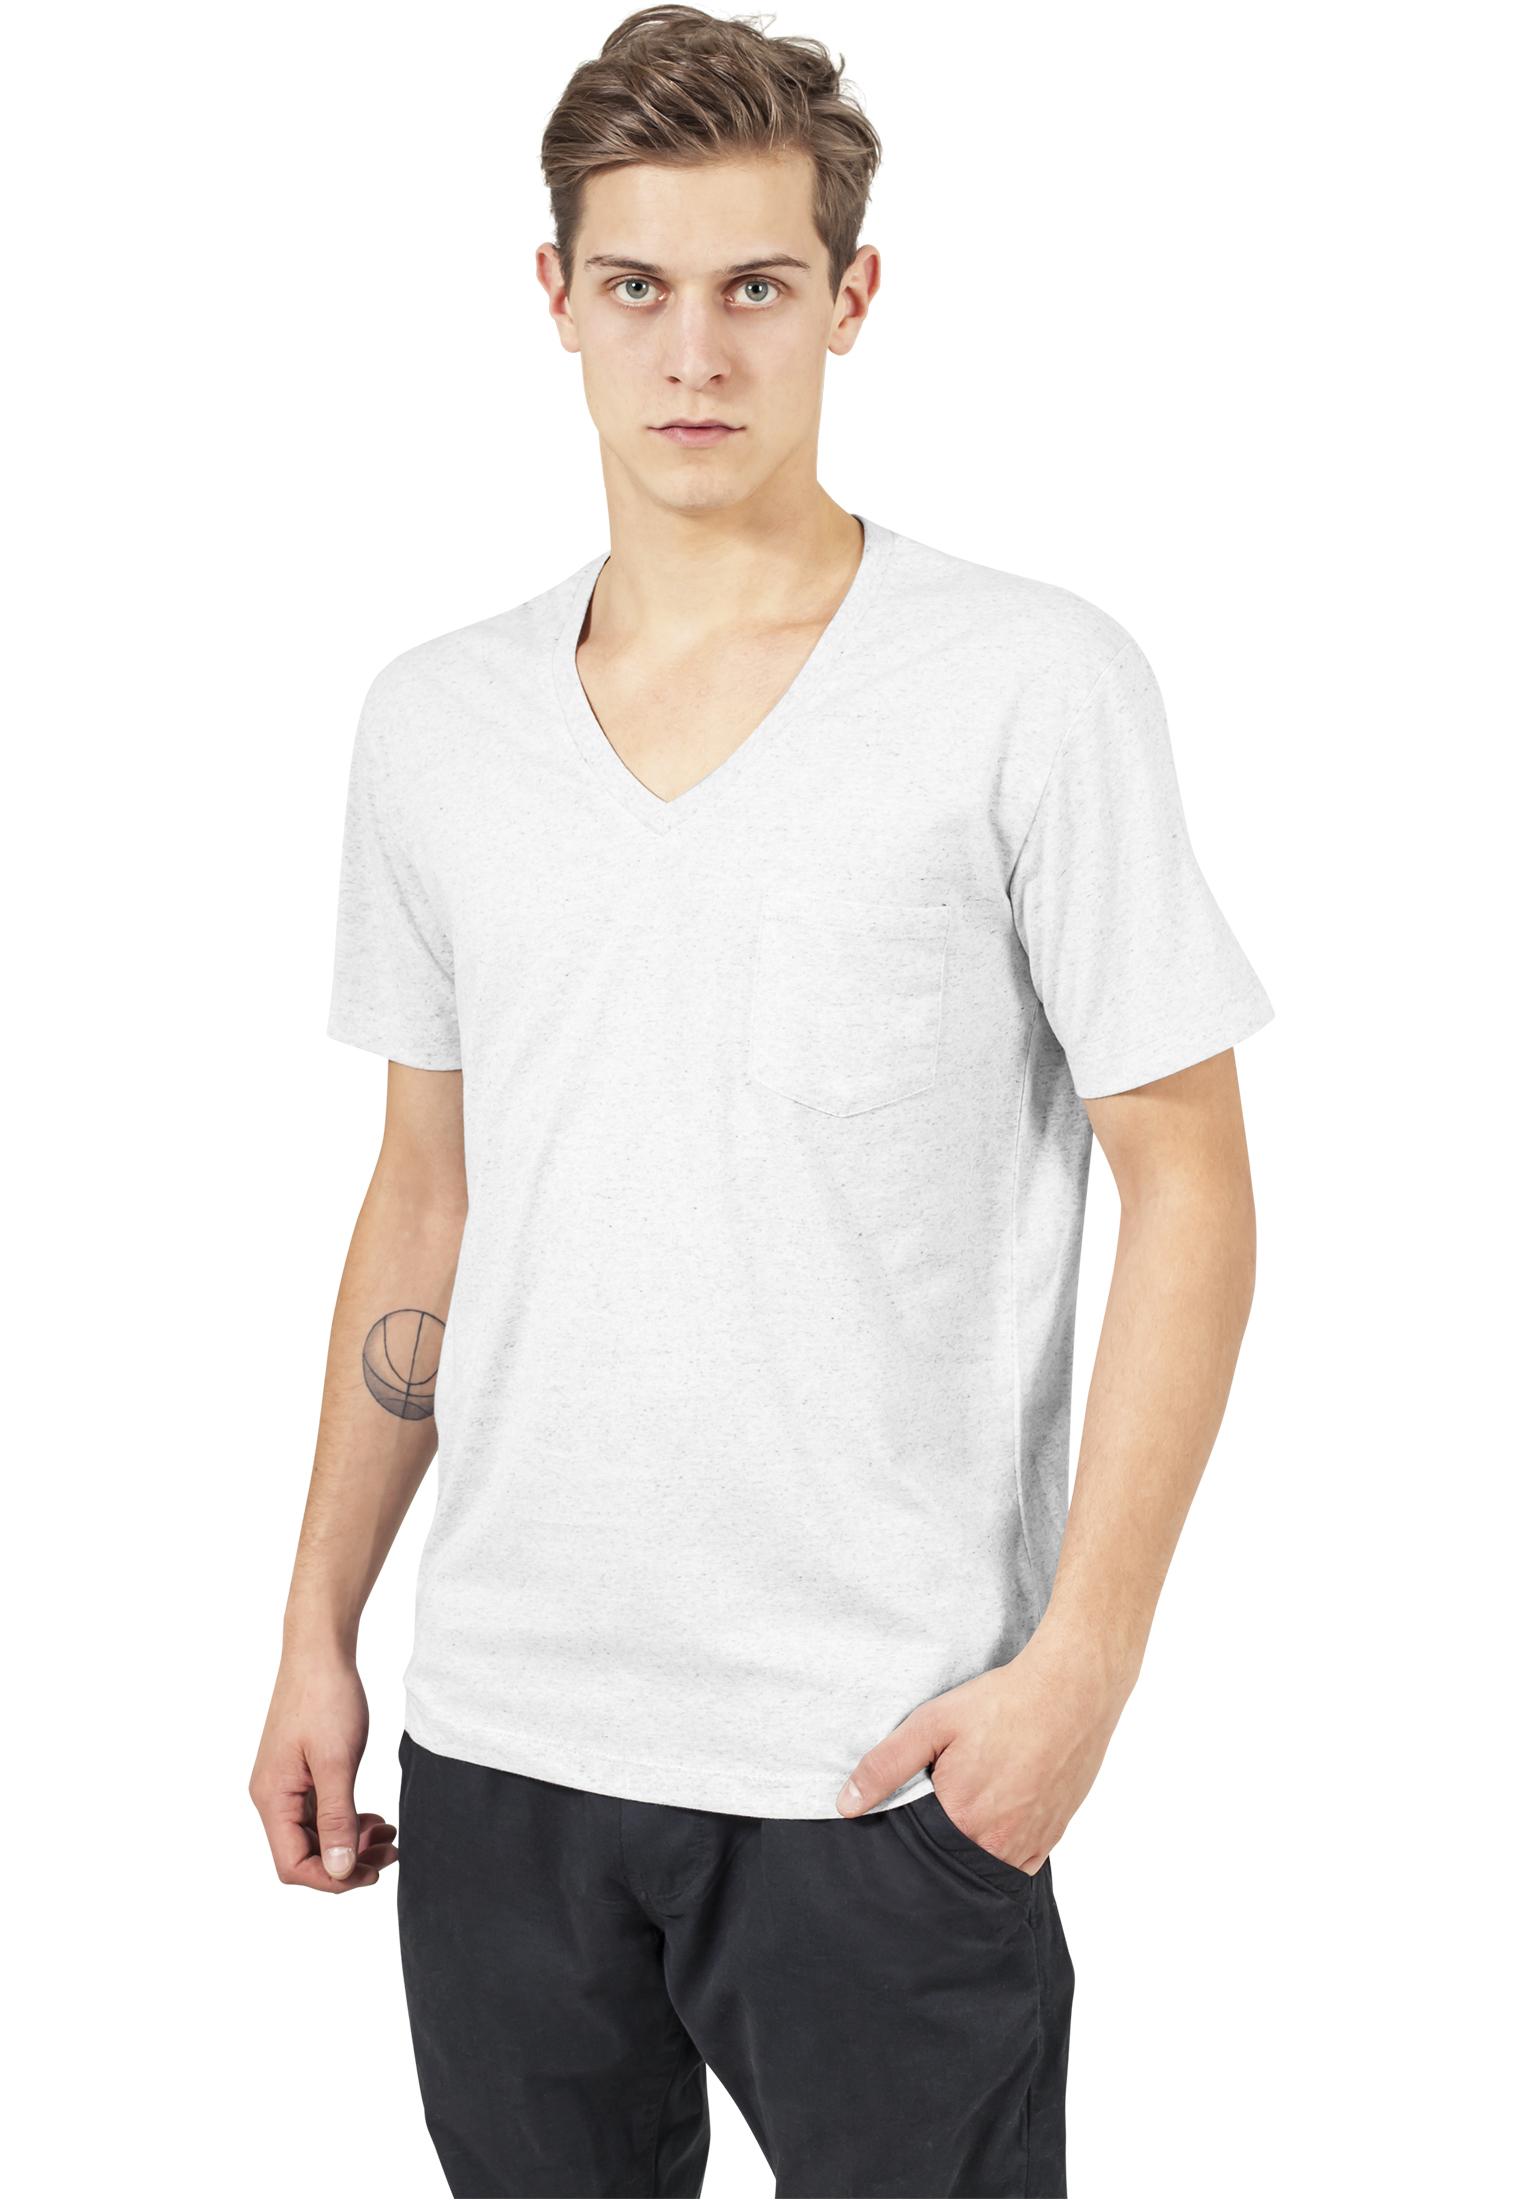 Urban Classics Basic V-Neck tee Camiseta para Hombre